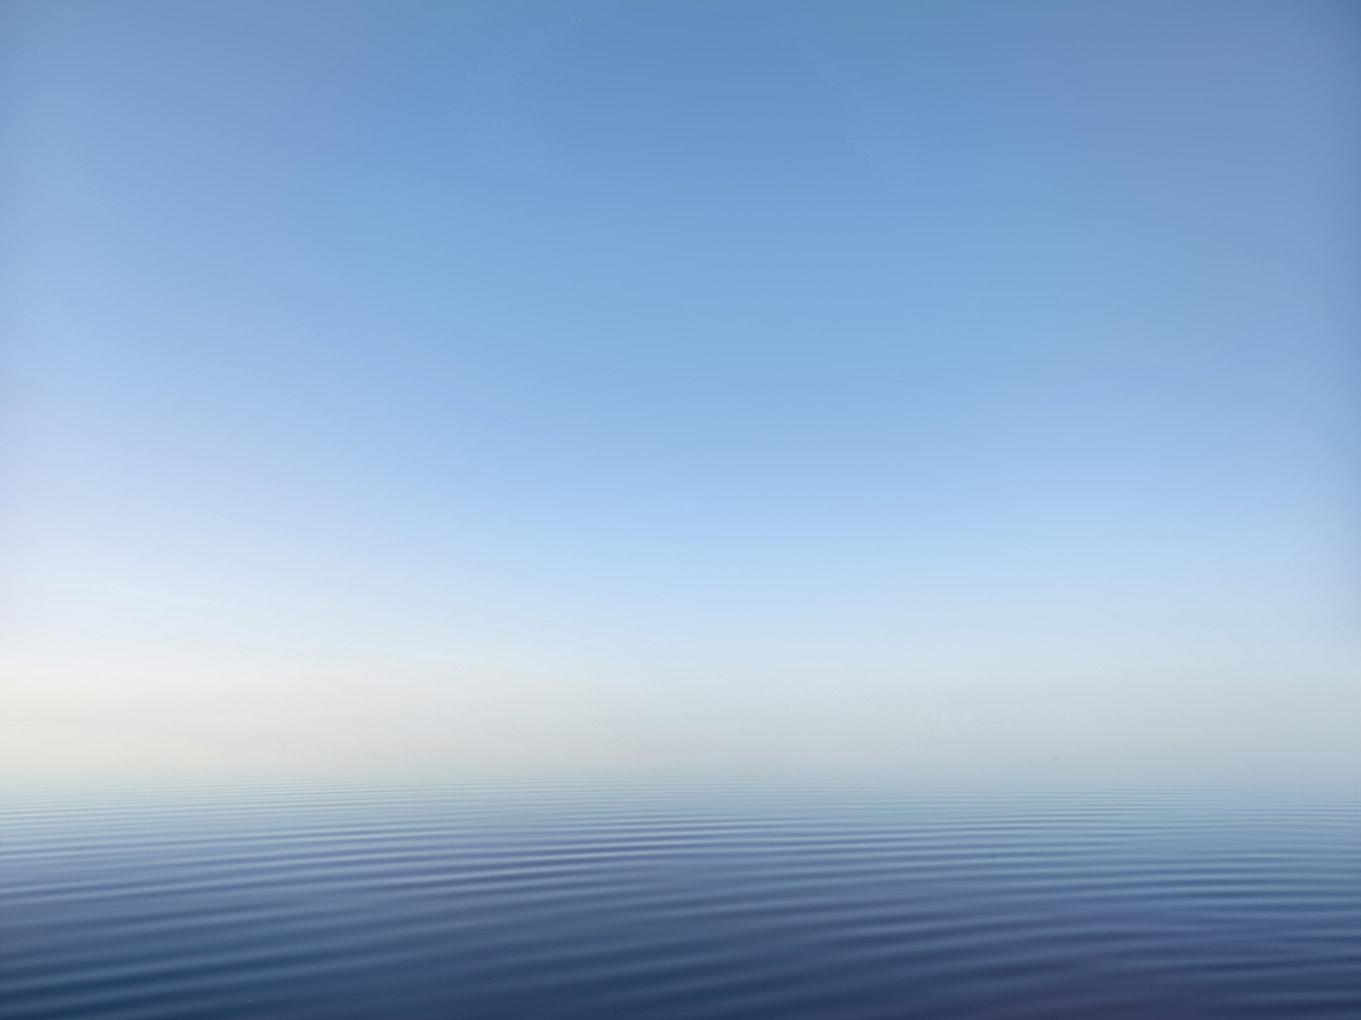 Salt 271, 120cm x 150cm, digital pigment print on cotton rag, edition of 7, 2010